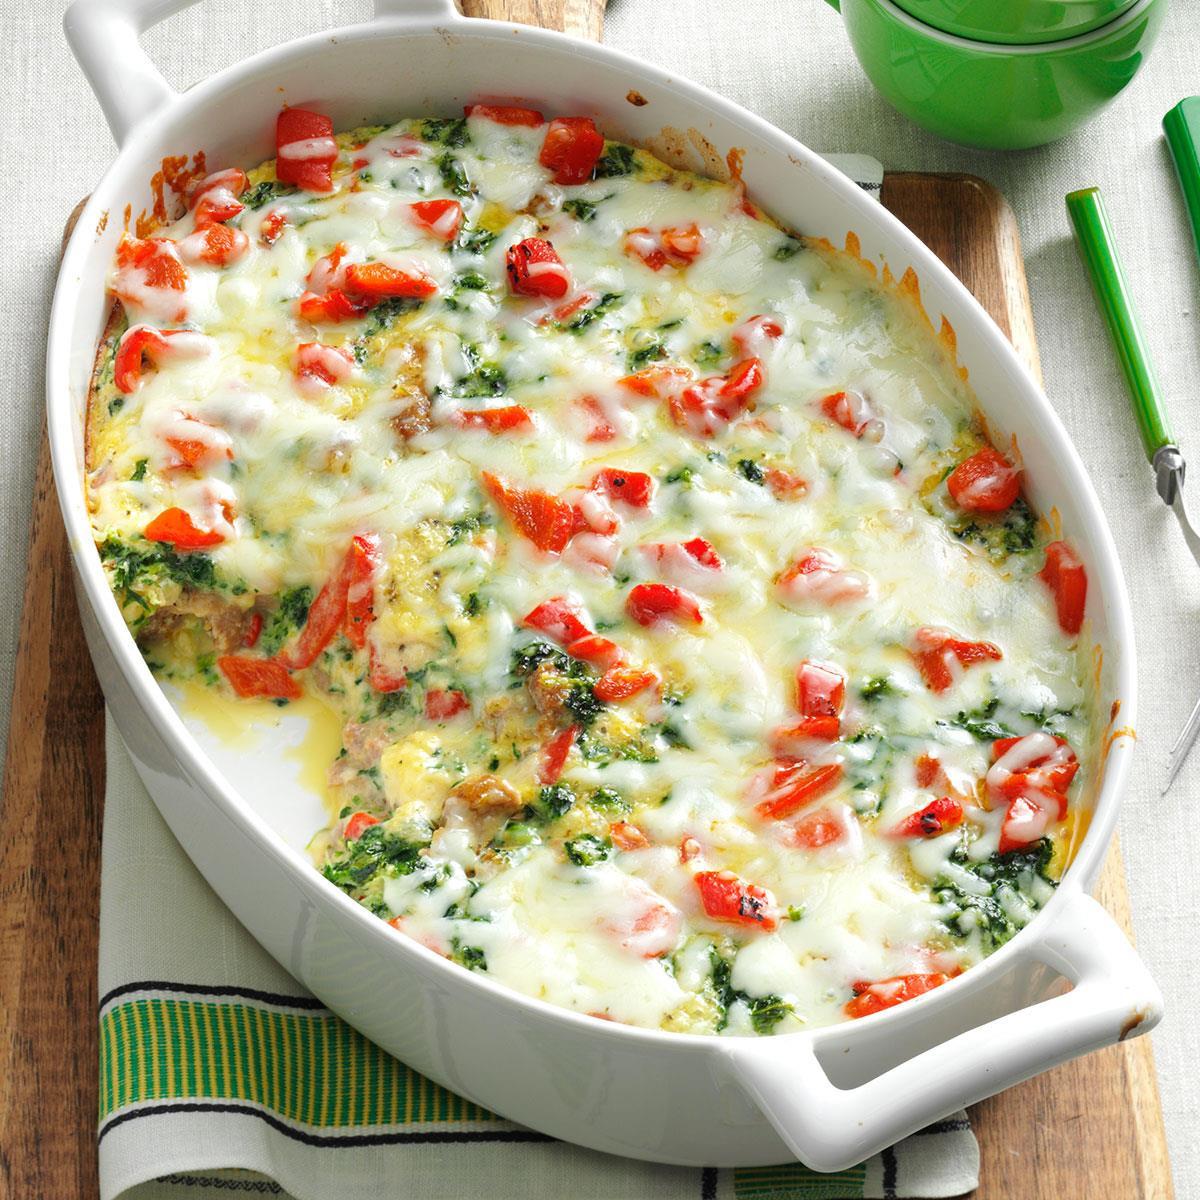 Christmas Breakfast Casserole Recipes  Christmas Breakfast Casserole Recipe